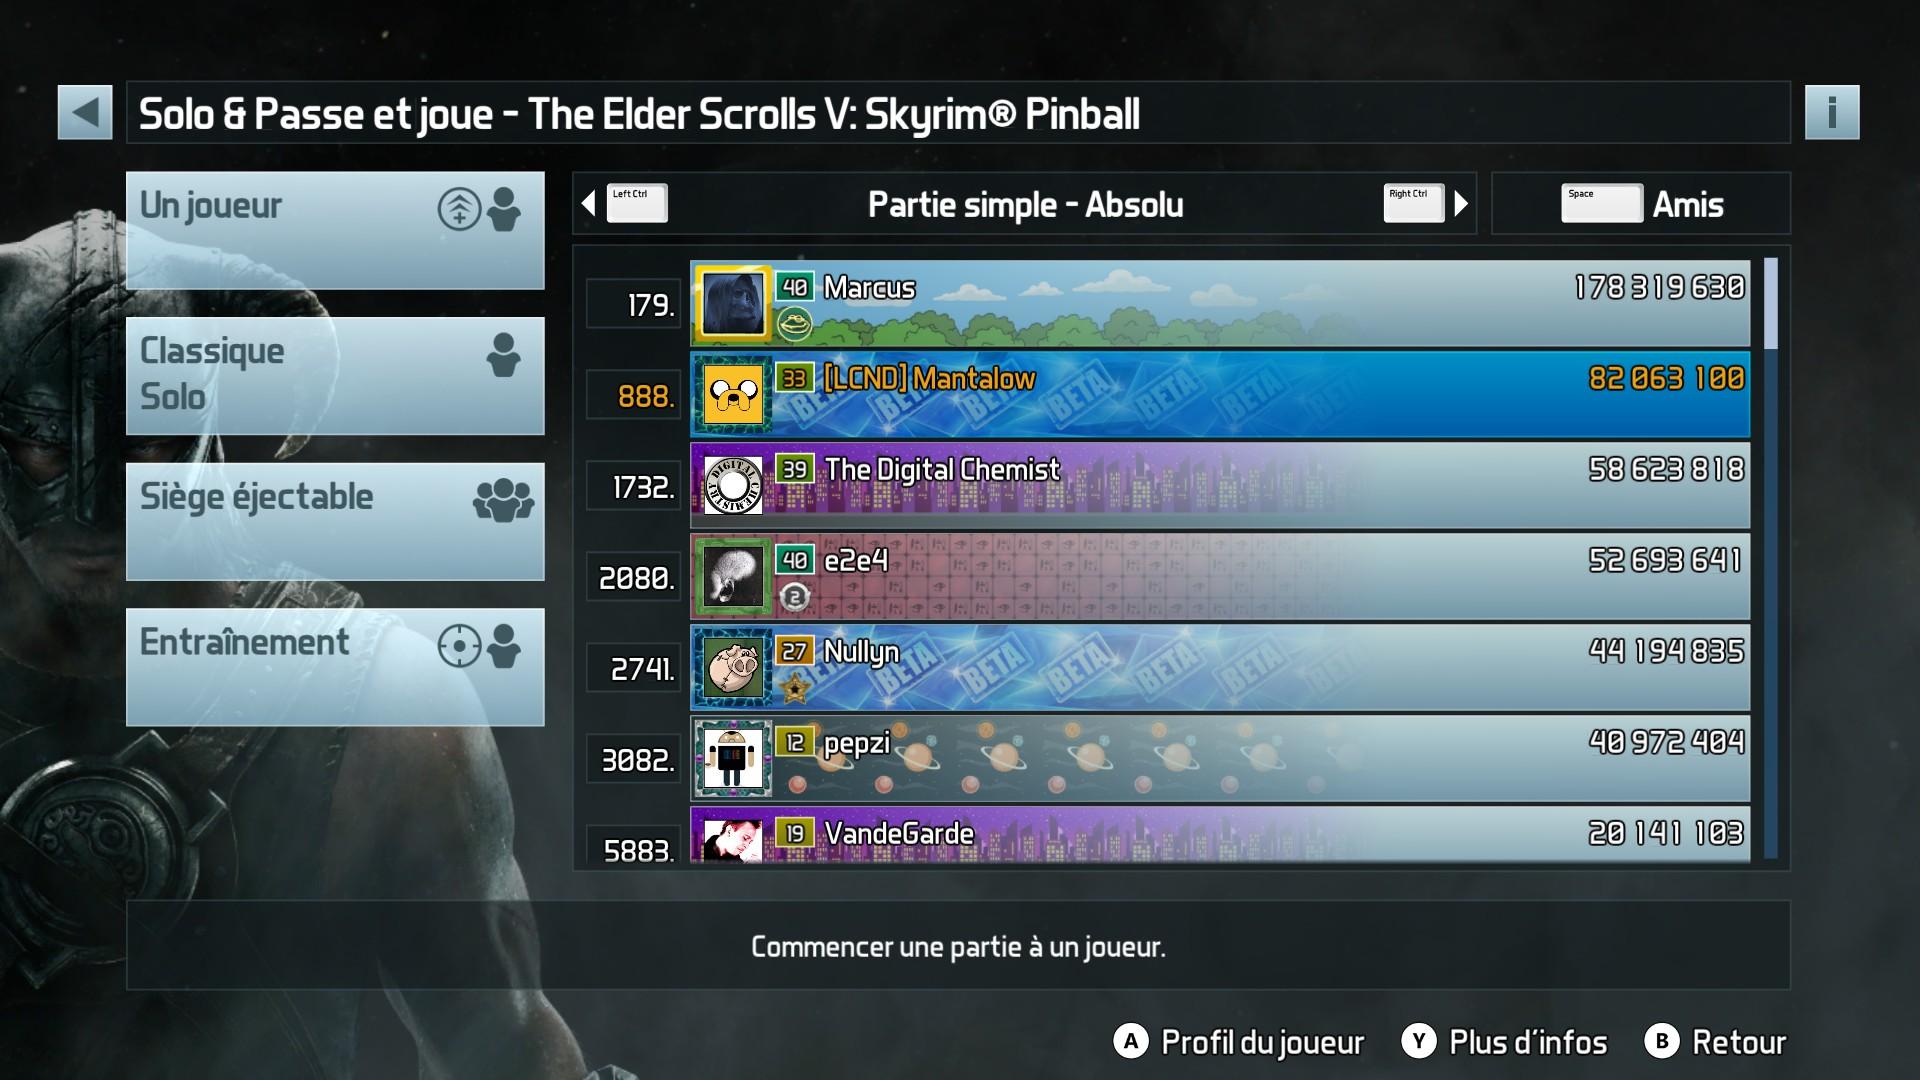 Mantalow: Pinball FX3: The Elder Scrolls V: Skyrim Pinball (PC) 82,063,100 points on 2018-01-16 13:02:39